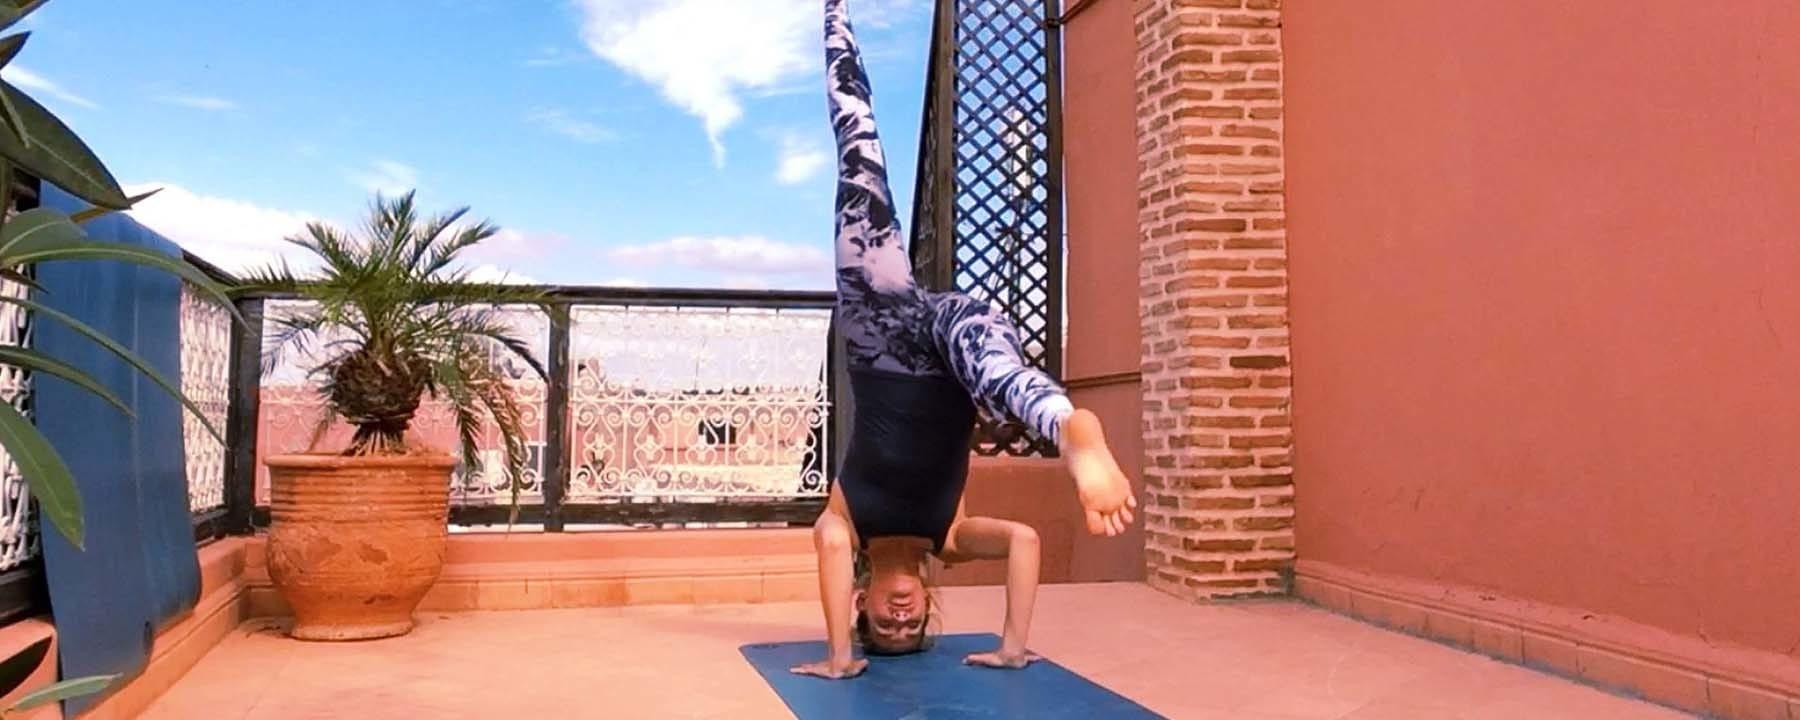 Headstand Marrakech rooftop yoga_Source Amanda LaMagna Livaligned